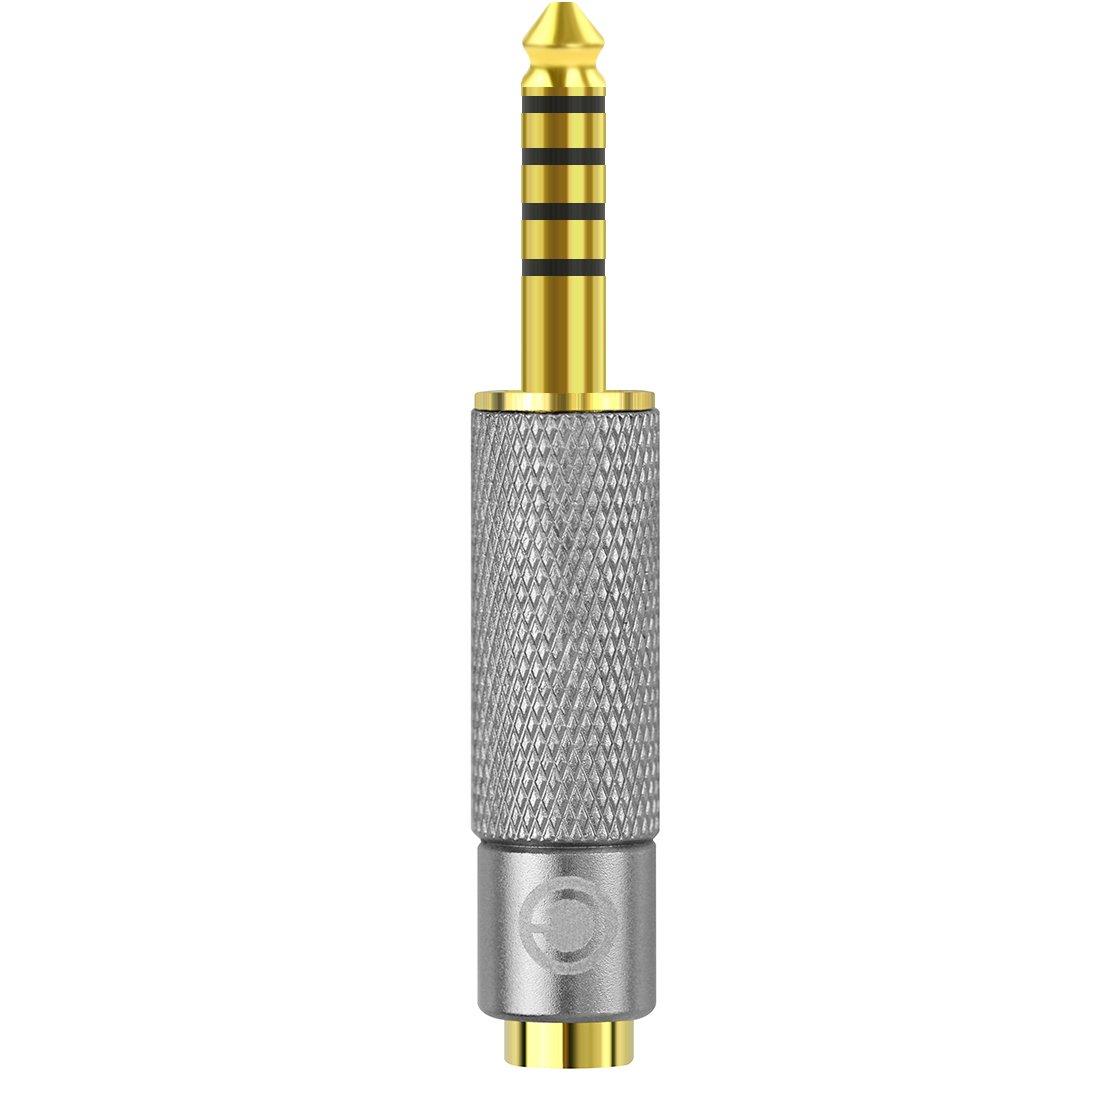 Adaptador 4.4mm Macho a 3.5mm Hembra Balanceado Geekria